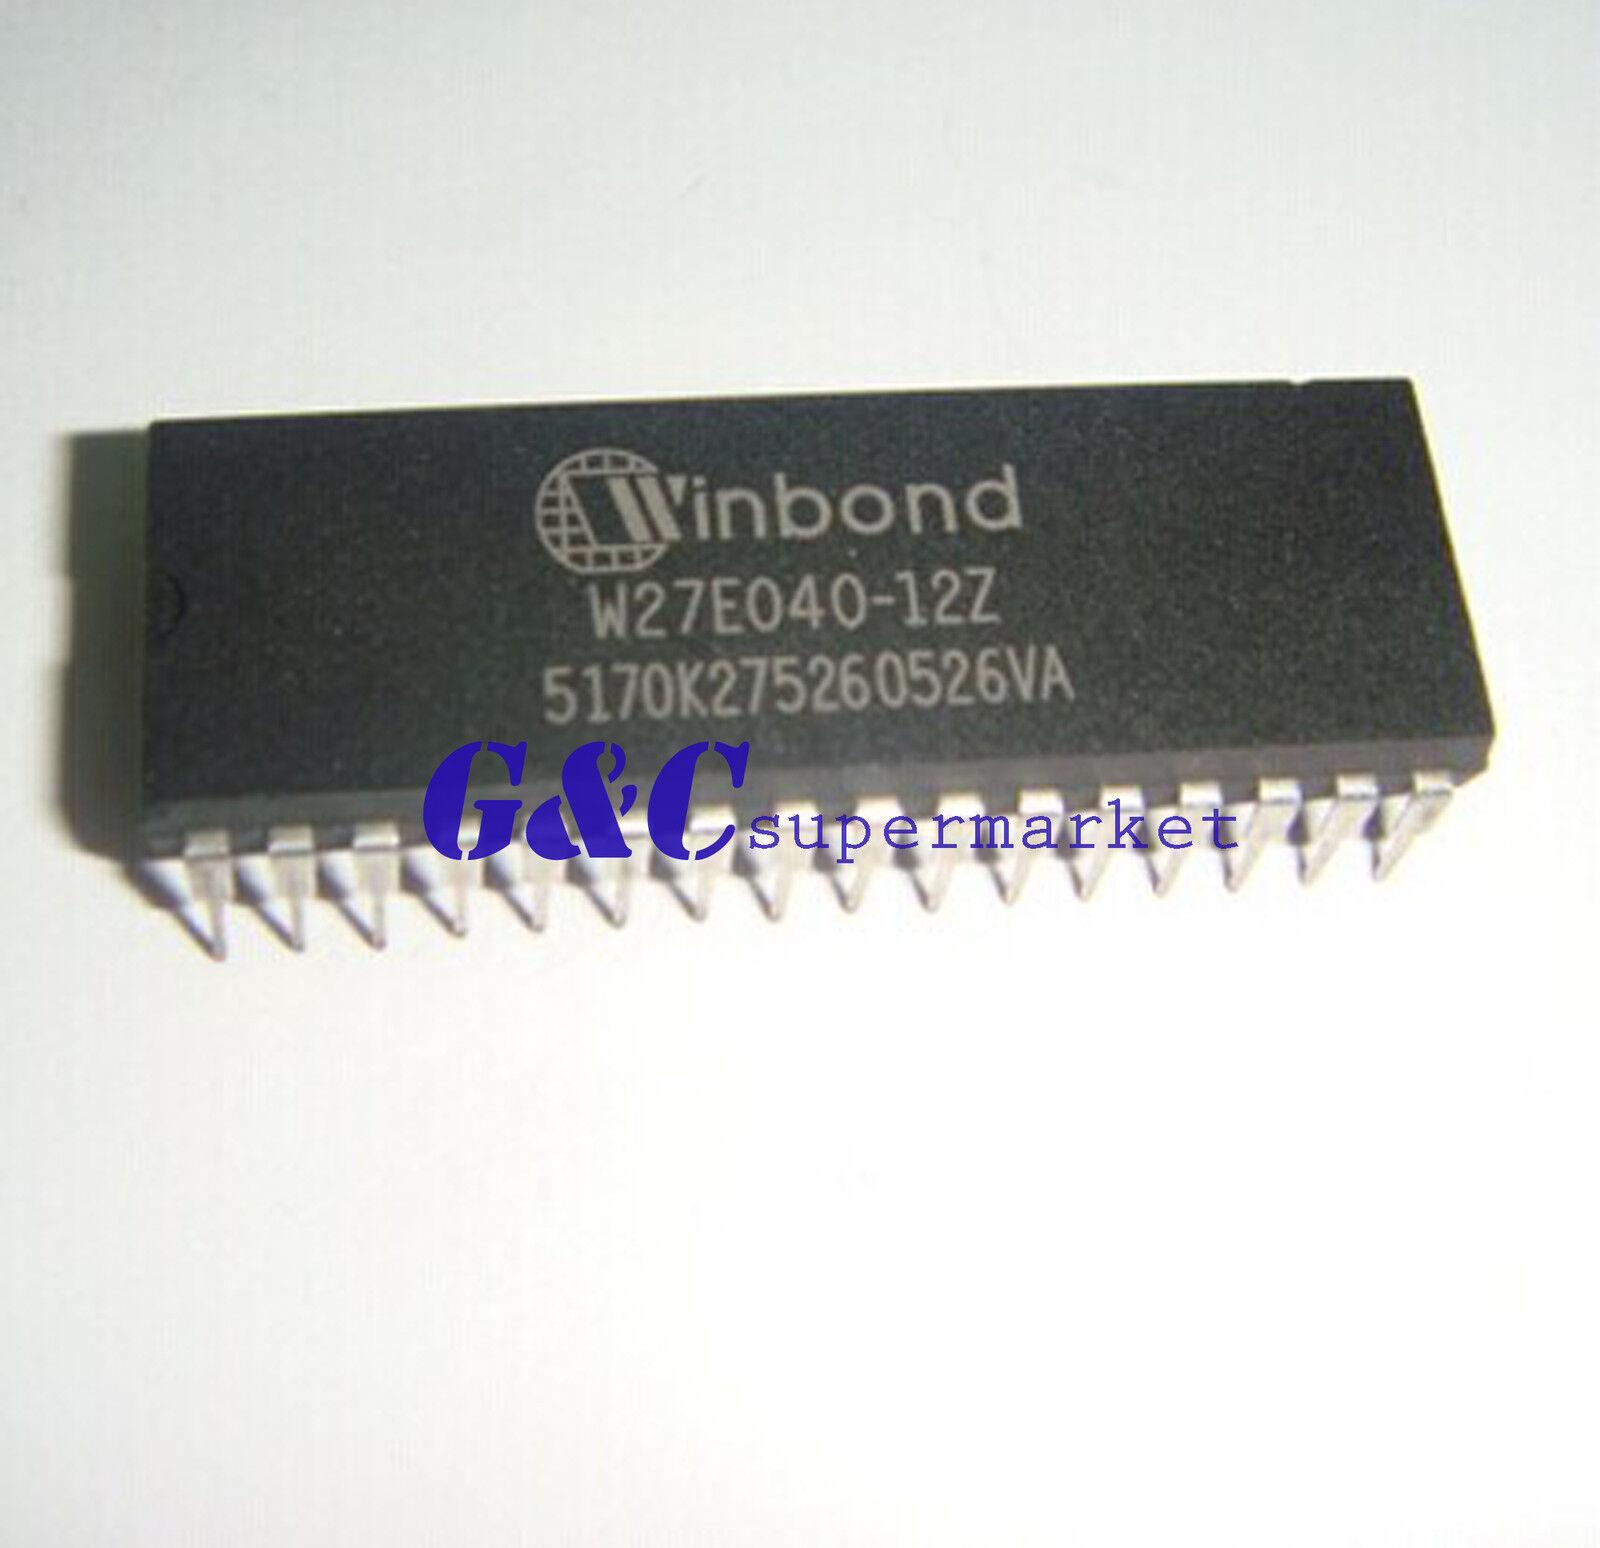 W27E040-12 W27E040 DIP-32 EProm IC Winbond